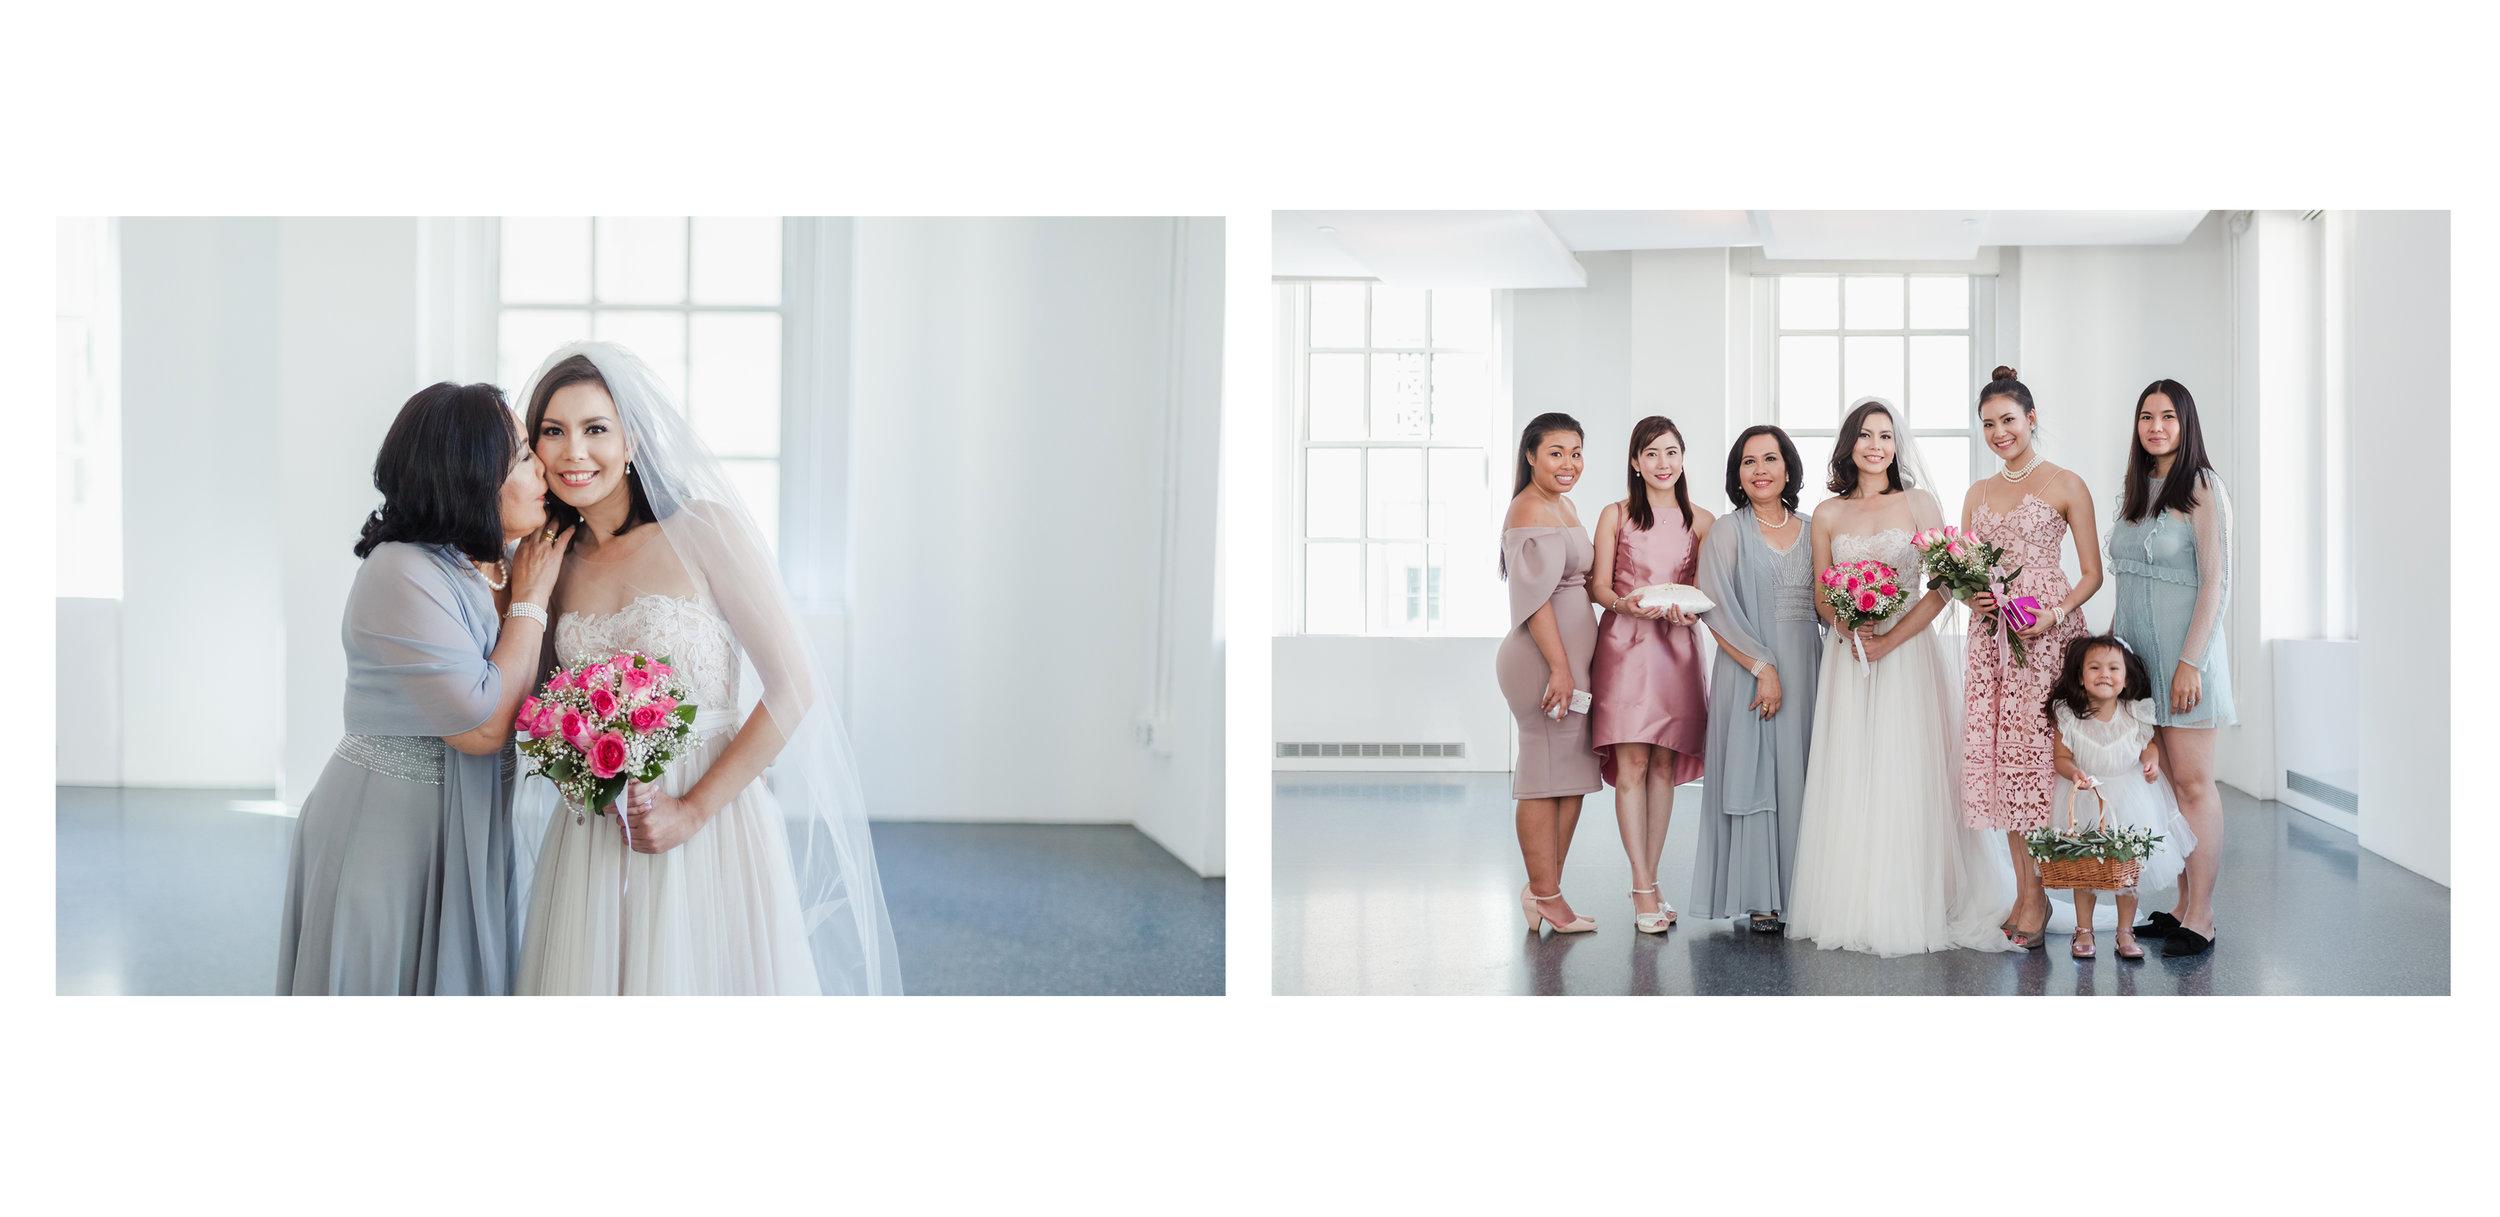 Eve&Jules_Wedding_Day_010.jpg